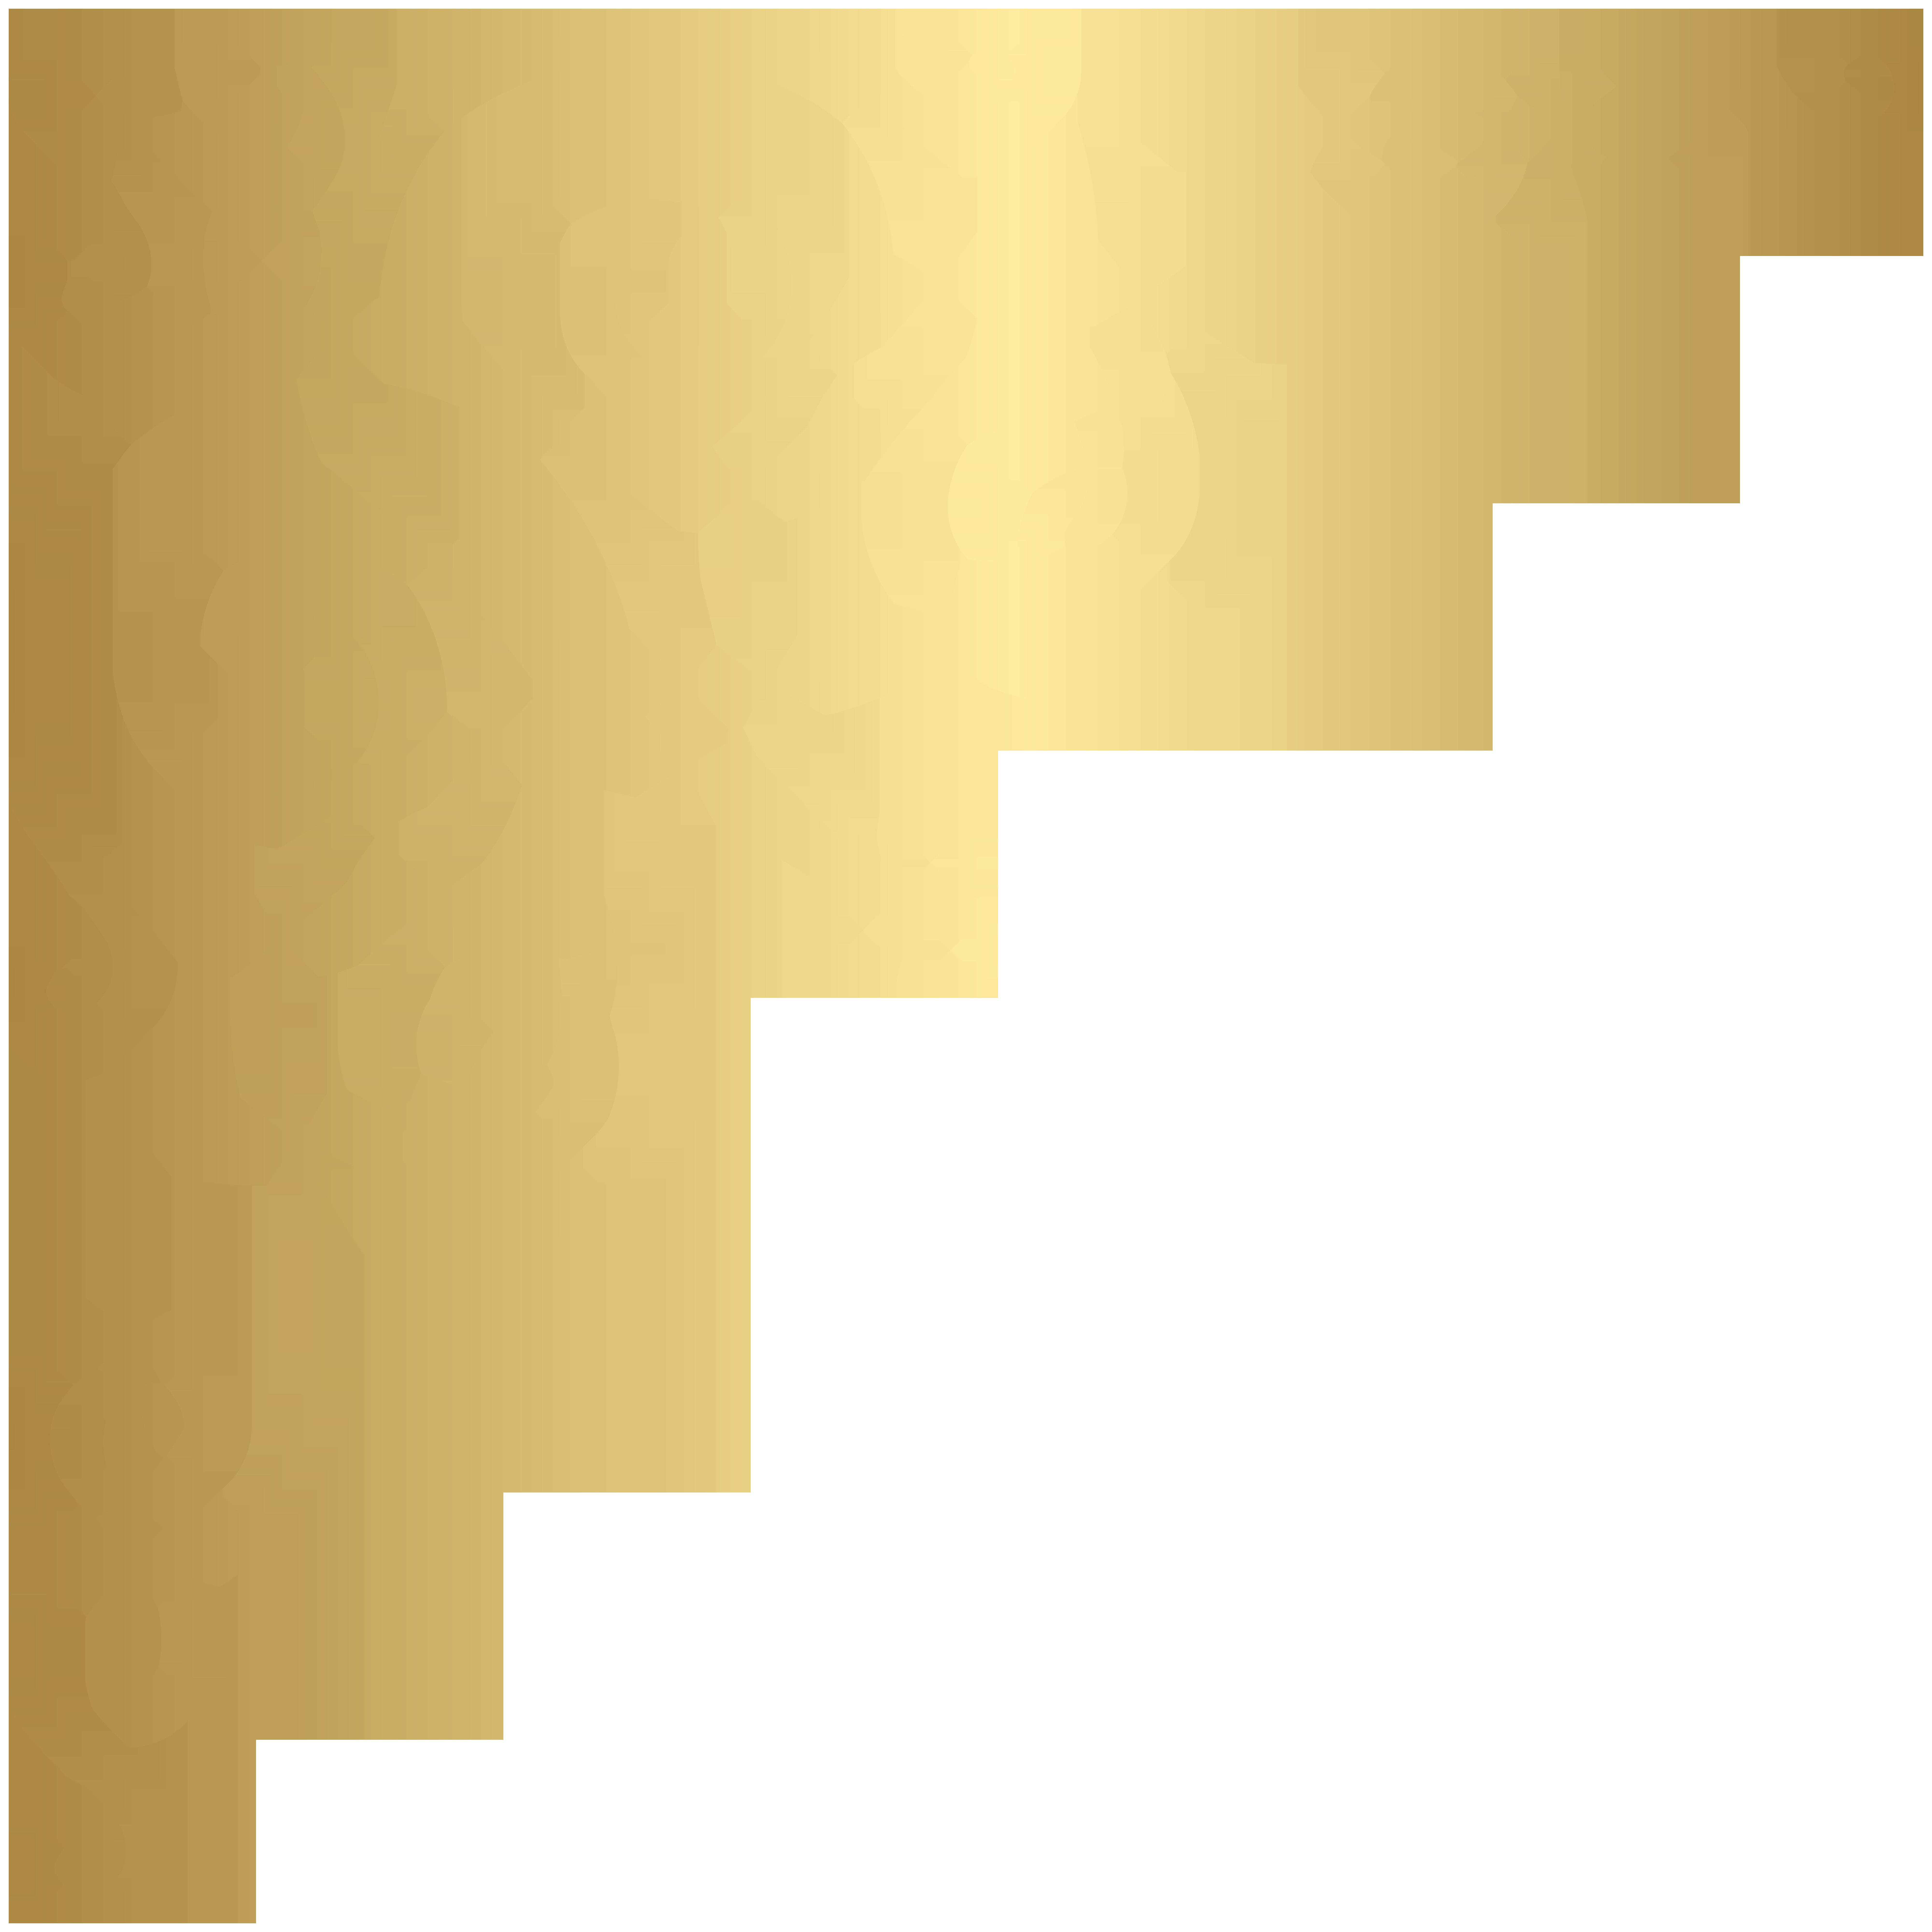 Gold clip art image. Wheat clipart corner